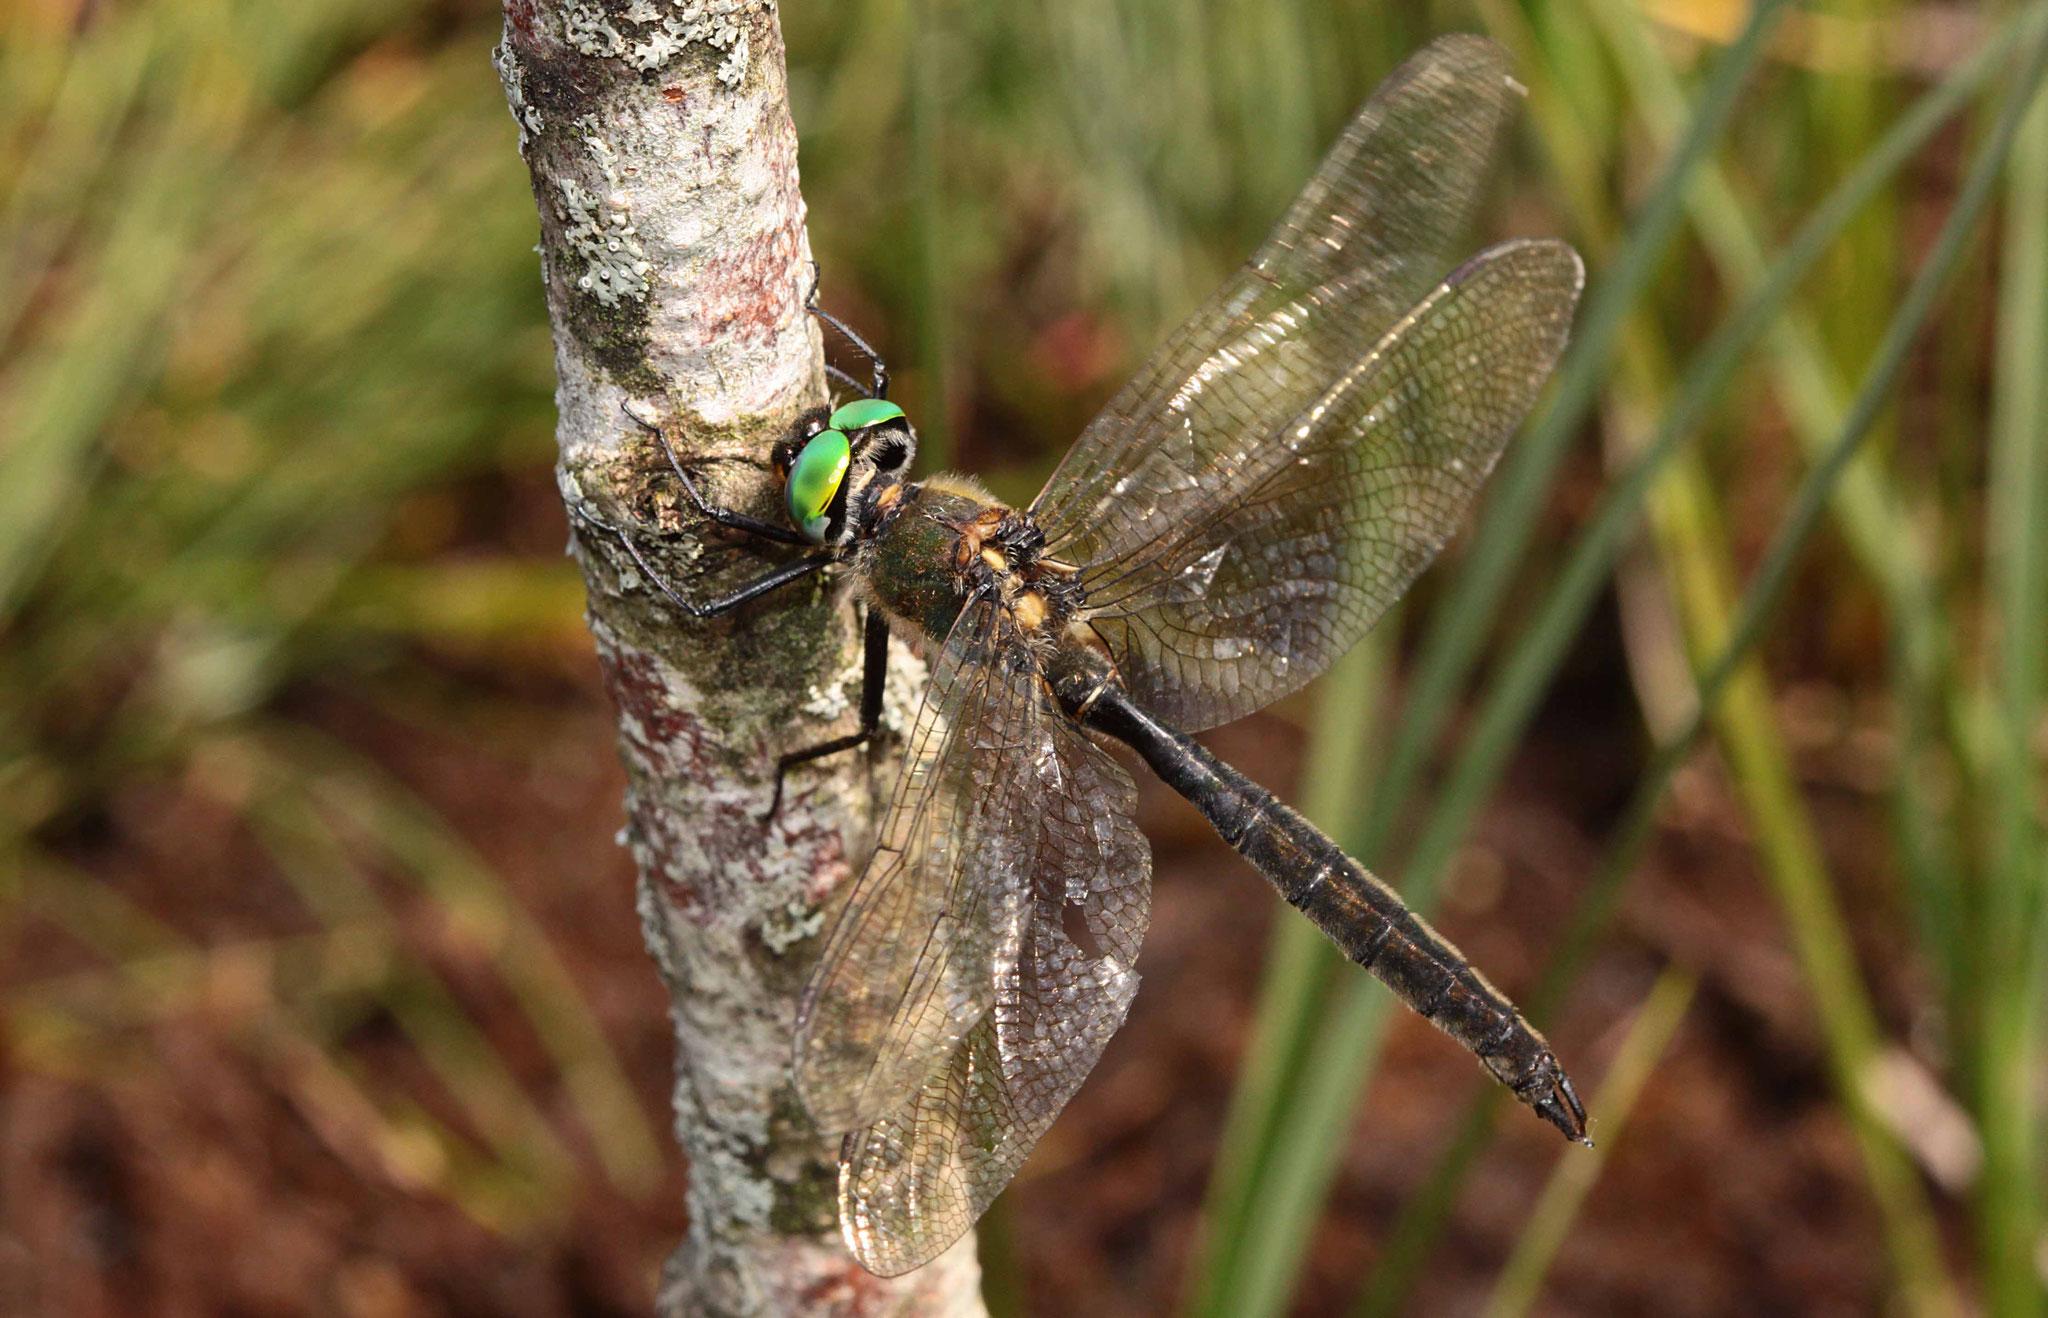 Alpen-Smaragdlibelle, Somatochlora alpestris, Männchen.